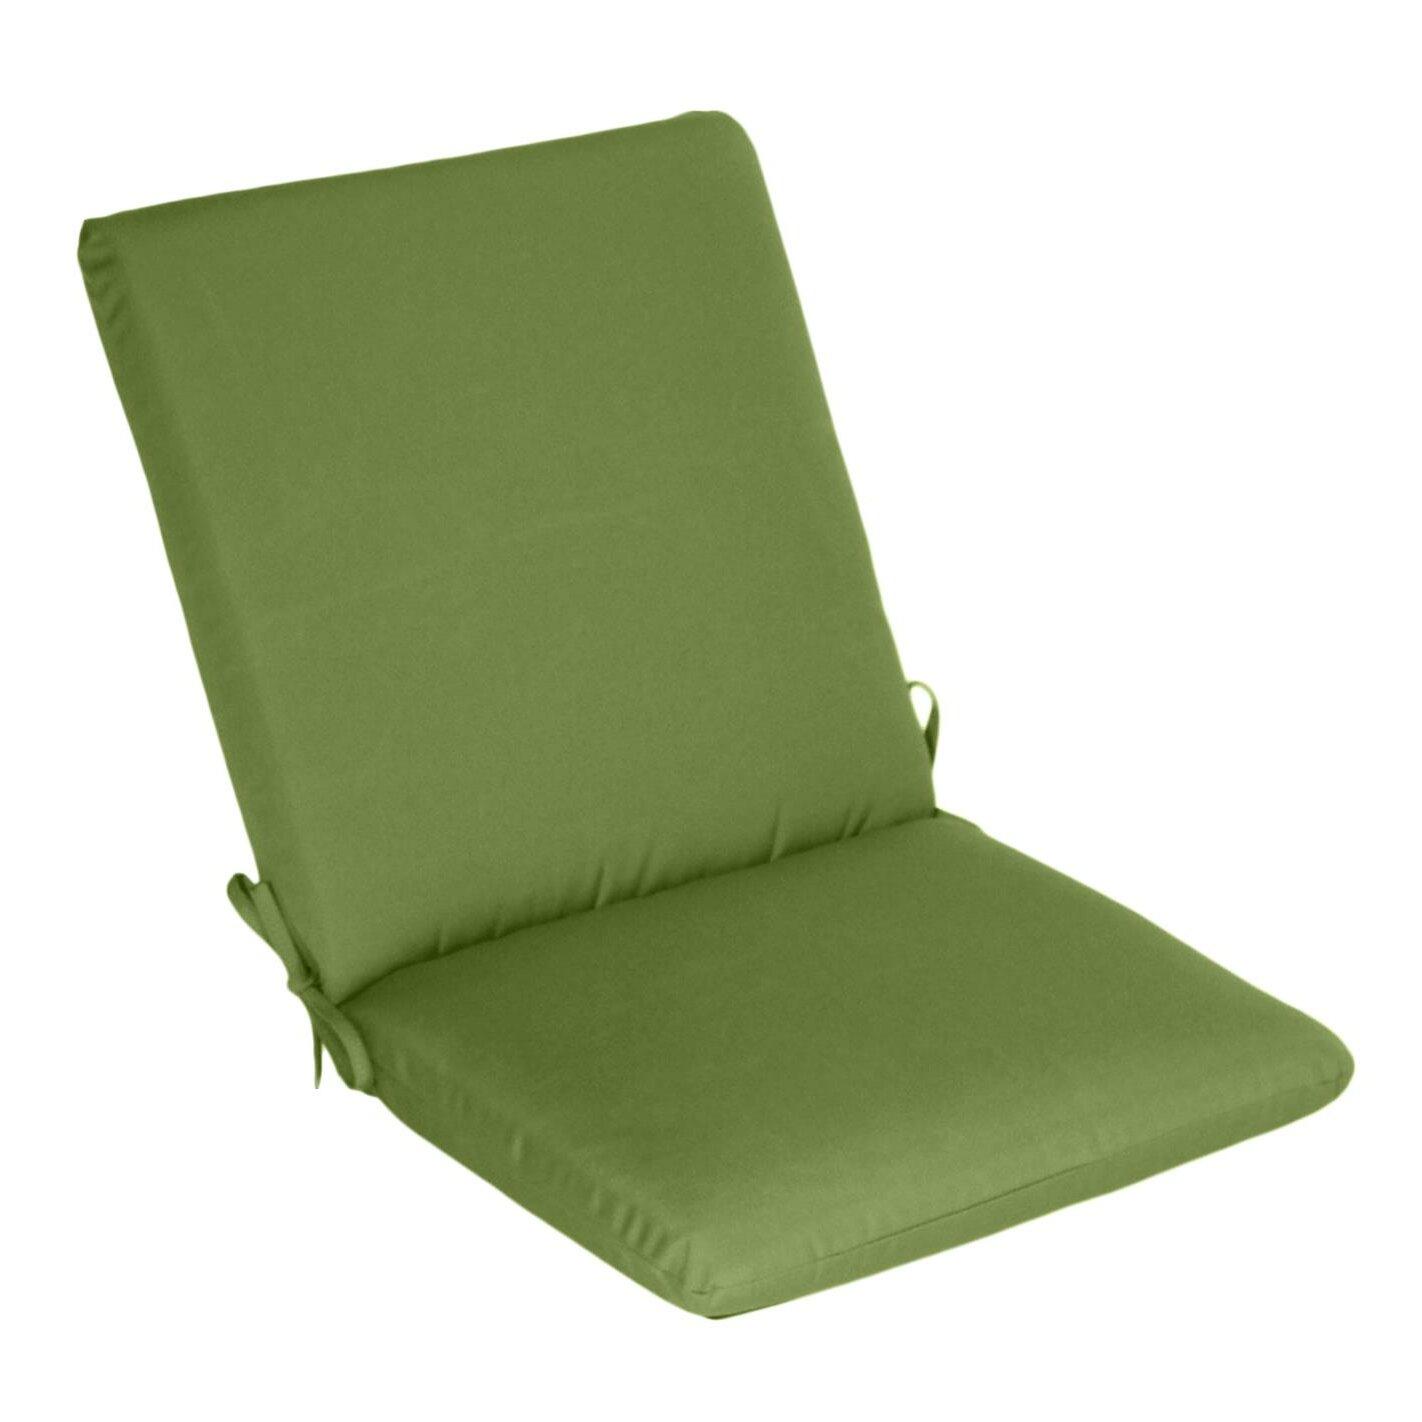 Wildon Home Outdoor Sunbrella High Back Cushion